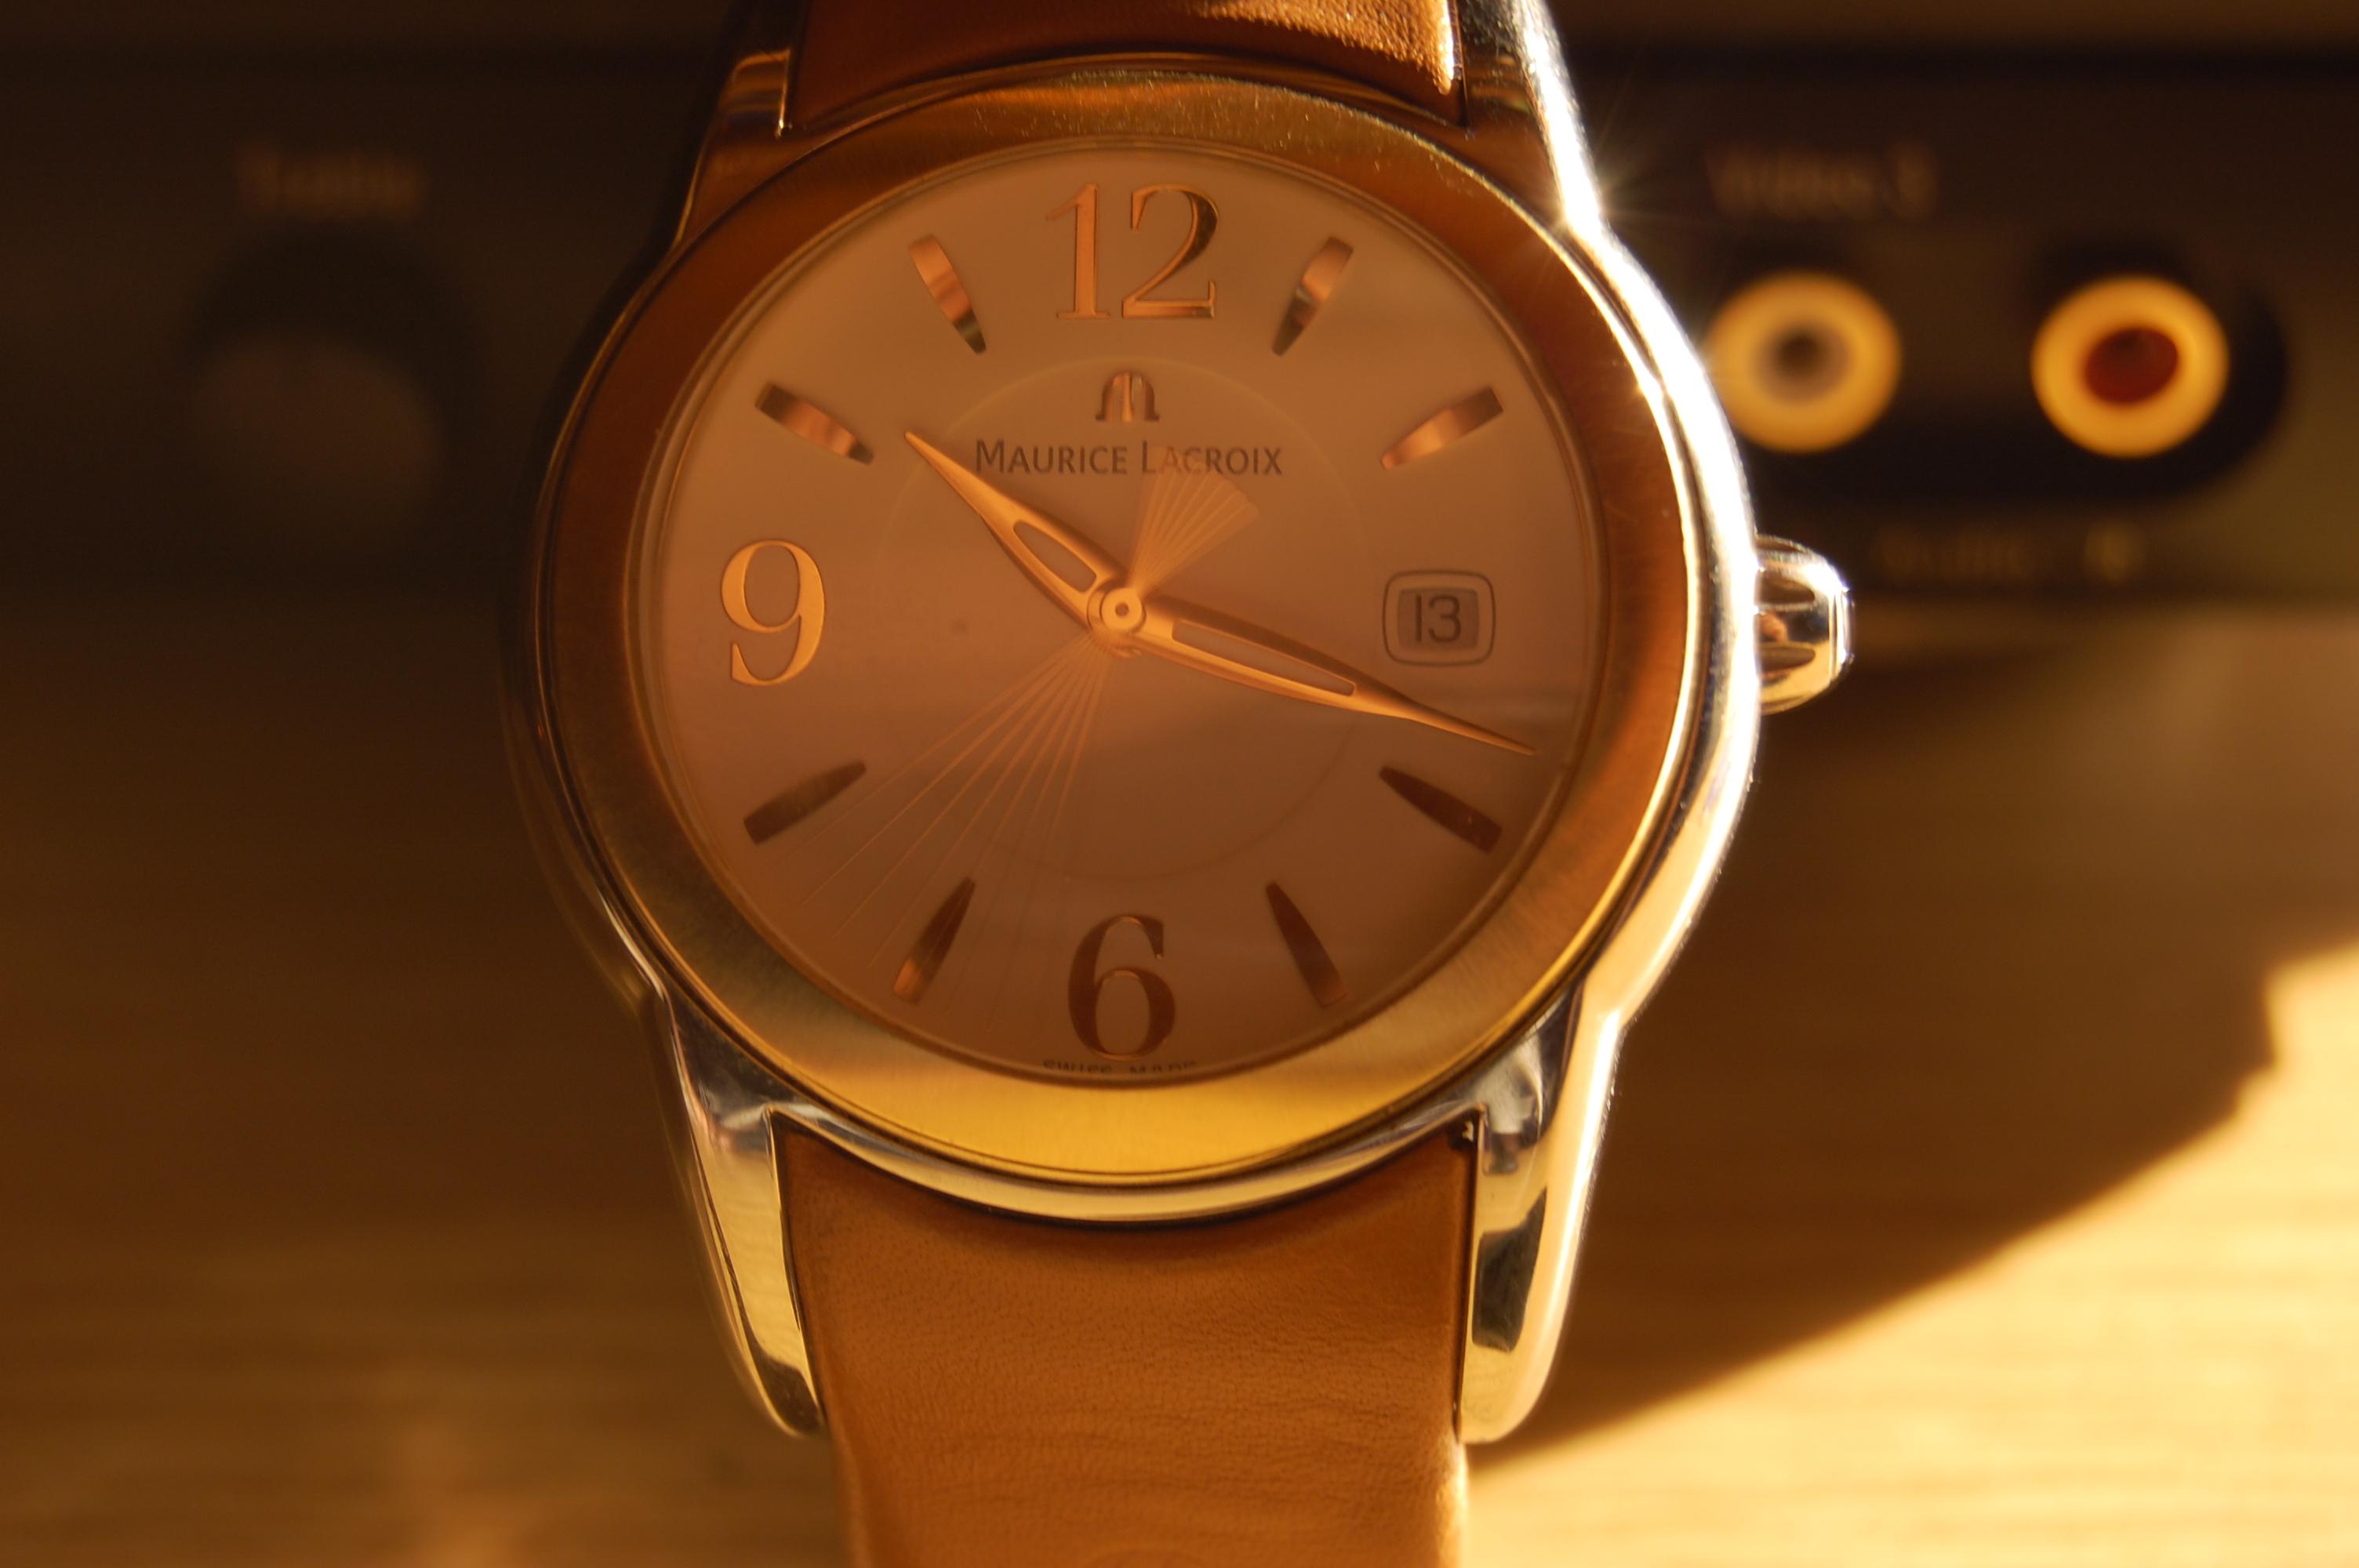 Fake rolex kinetic watches audemars piguet jules audemars watches for Audemars piguet kinetic